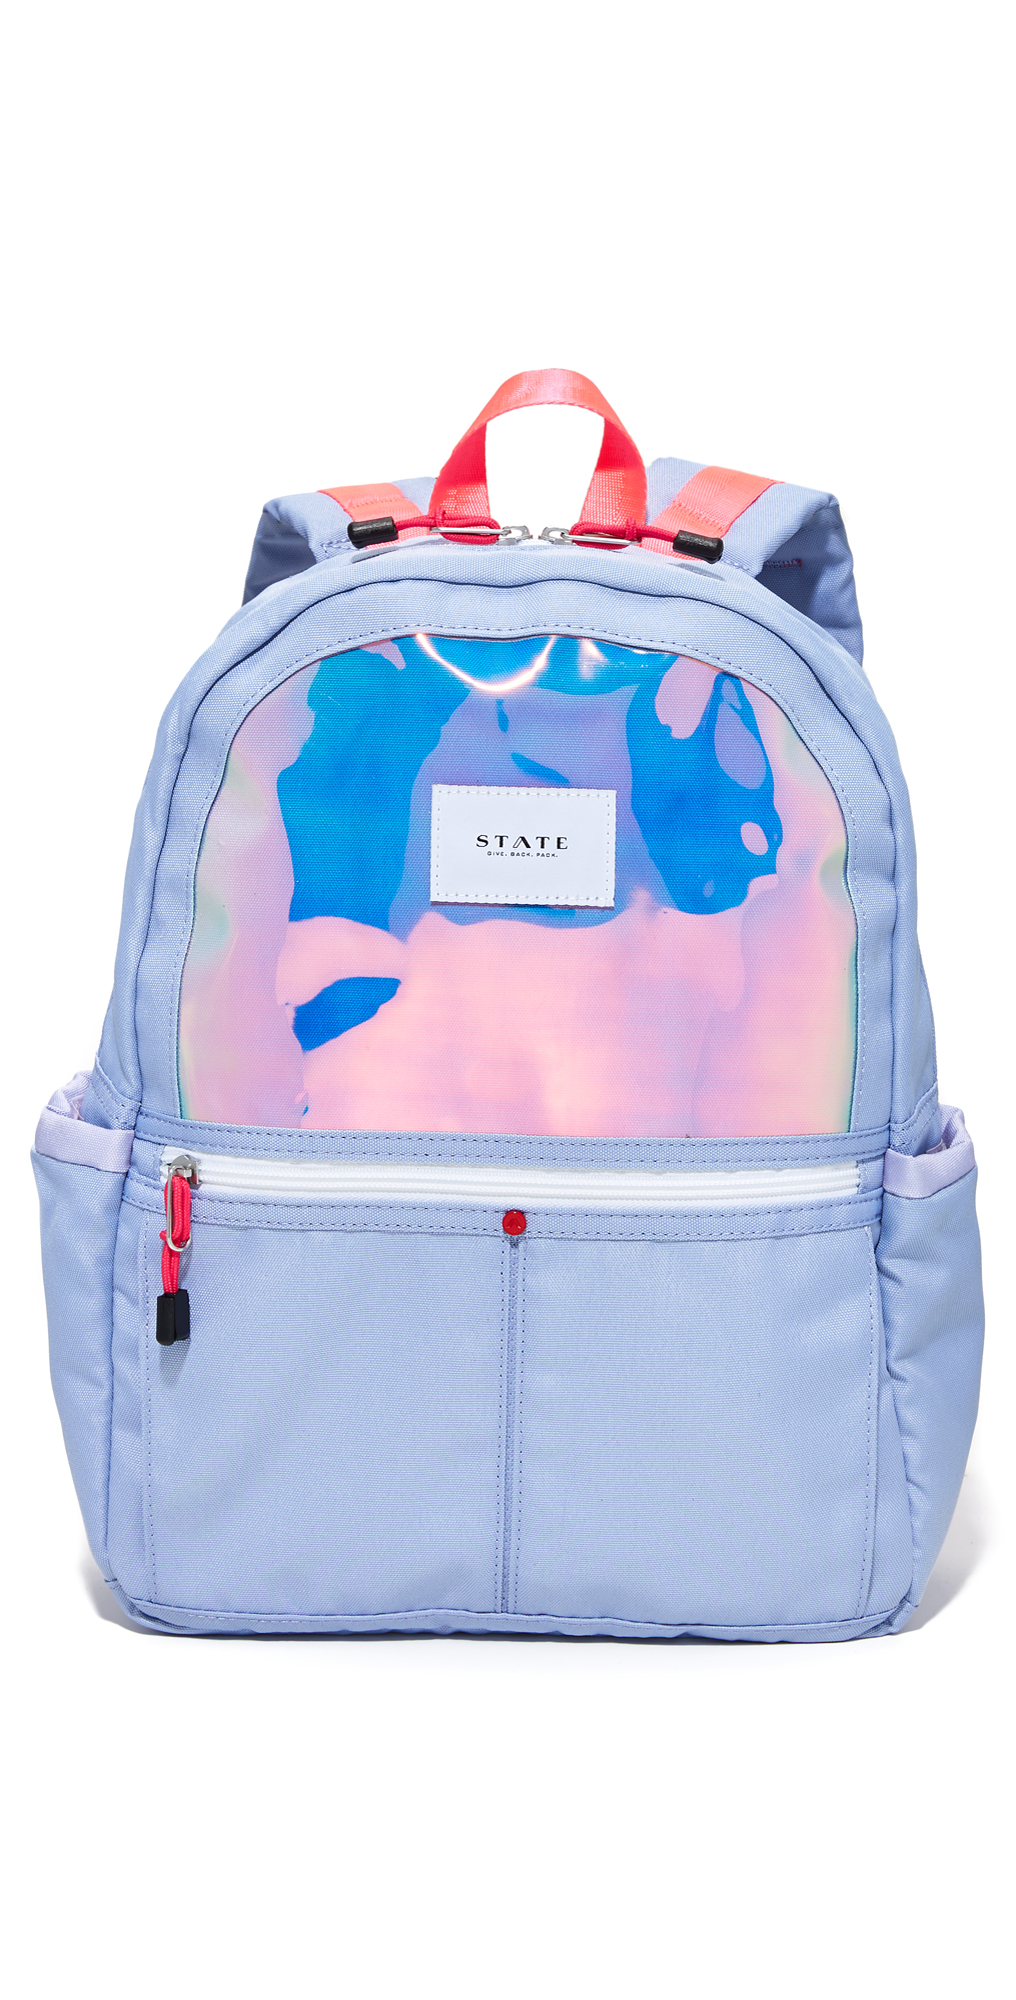 Kane Backpack STATE